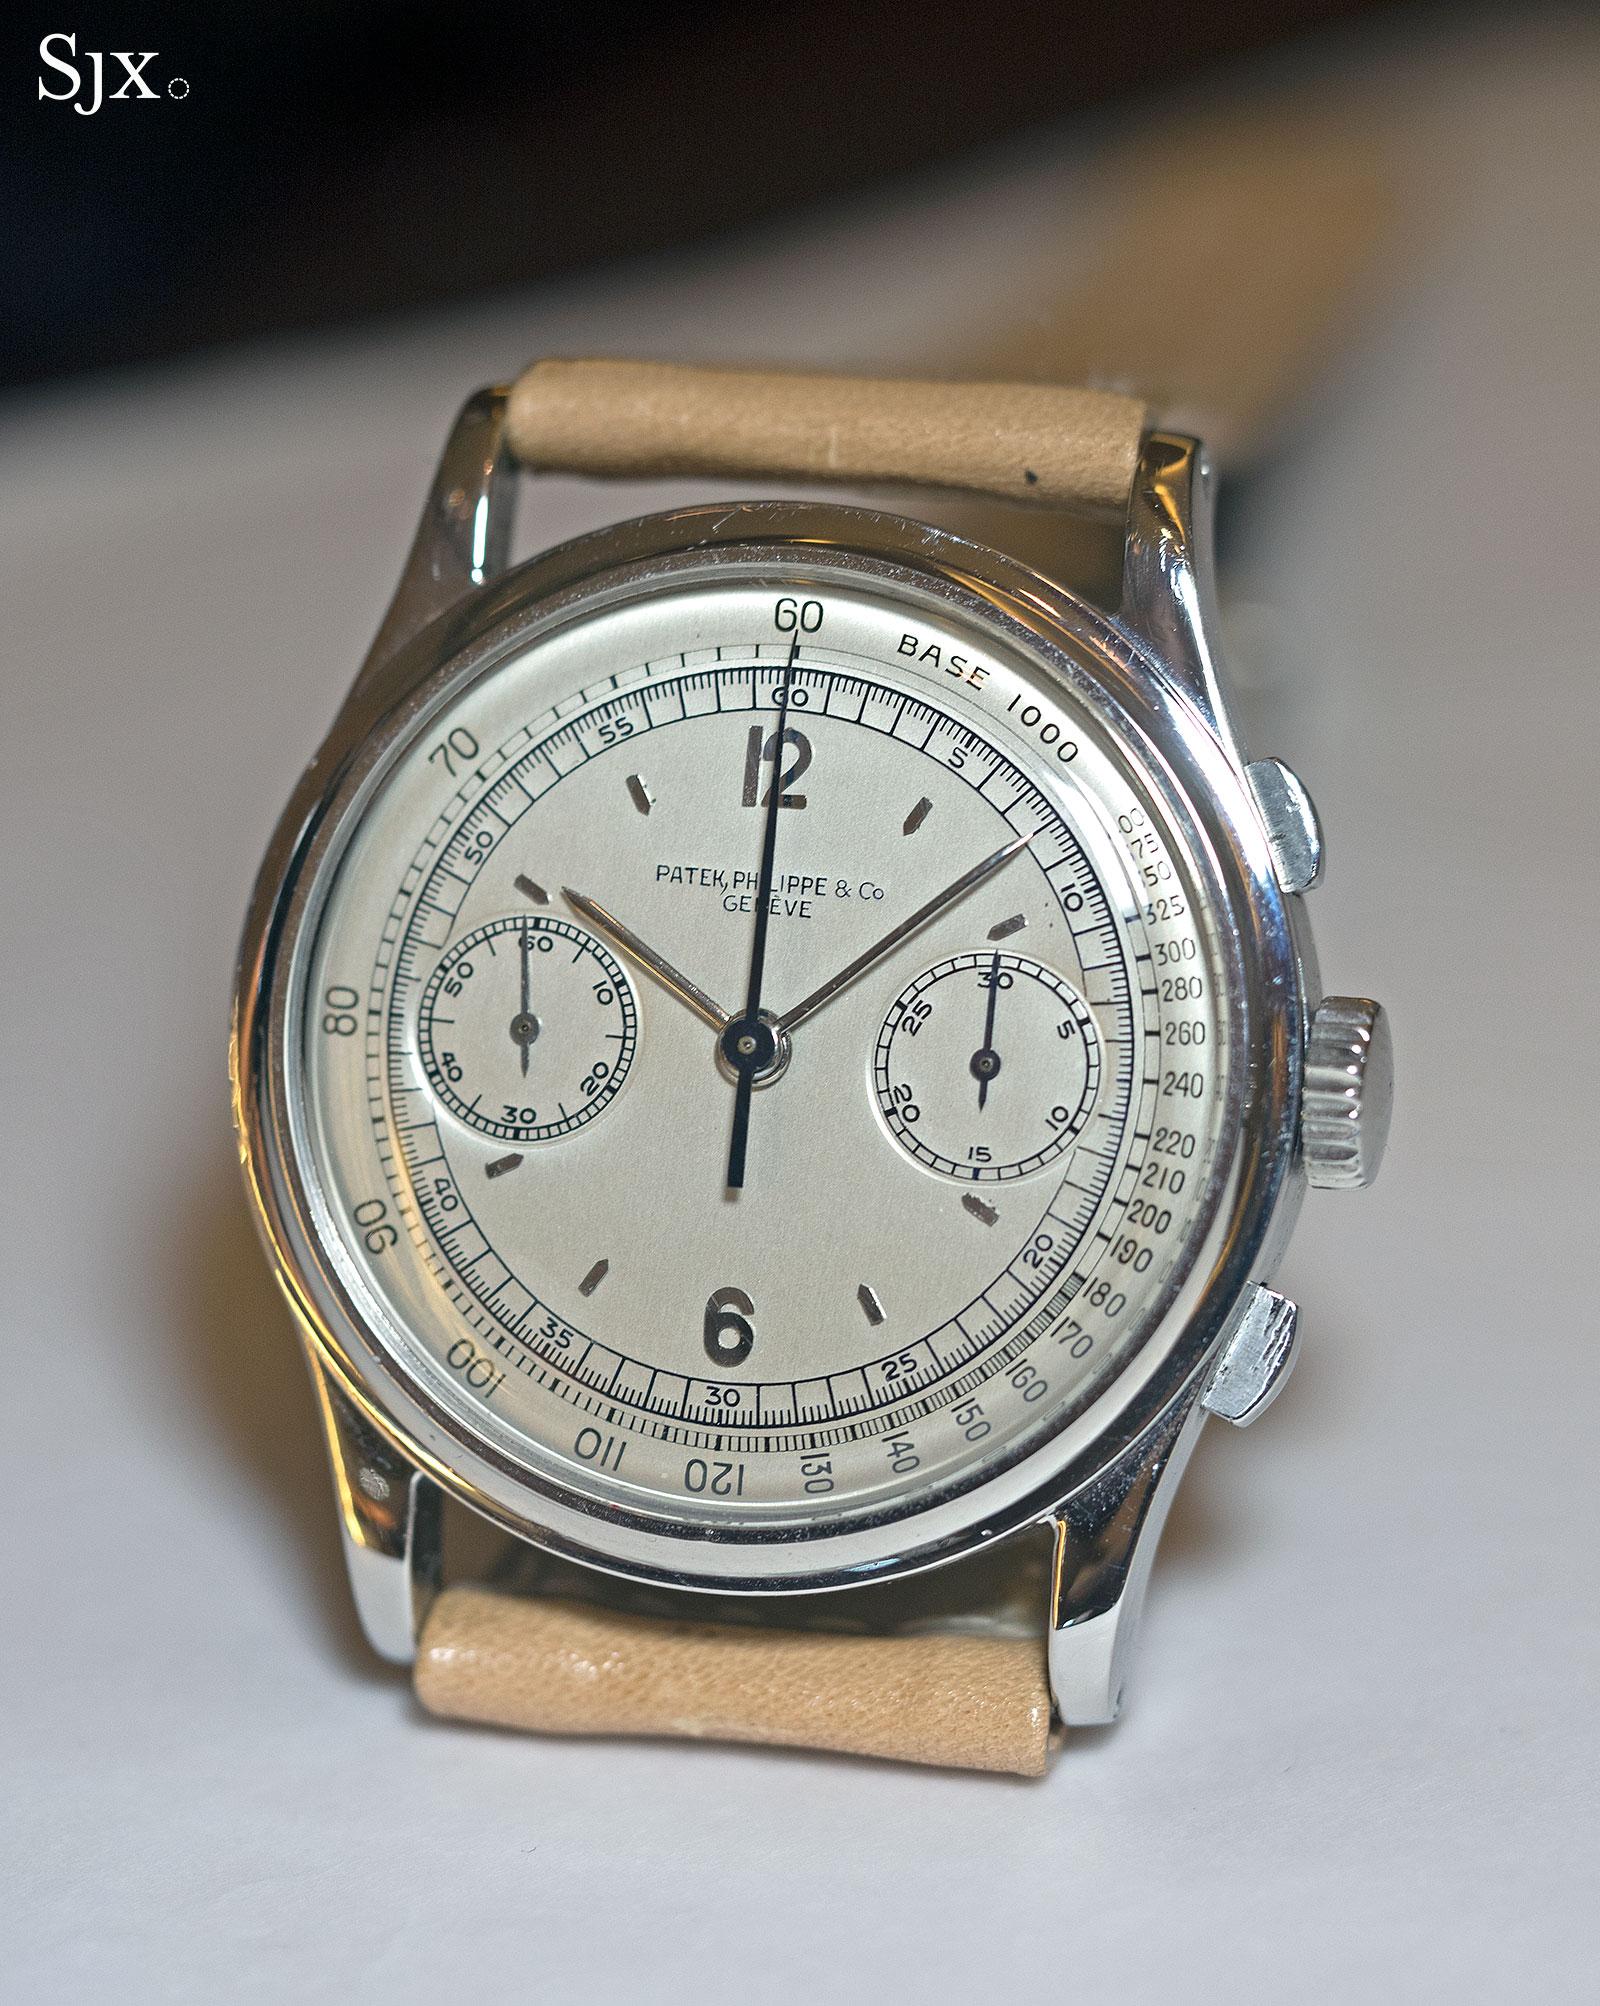 Patek Philippe 530 chronograph steel 4